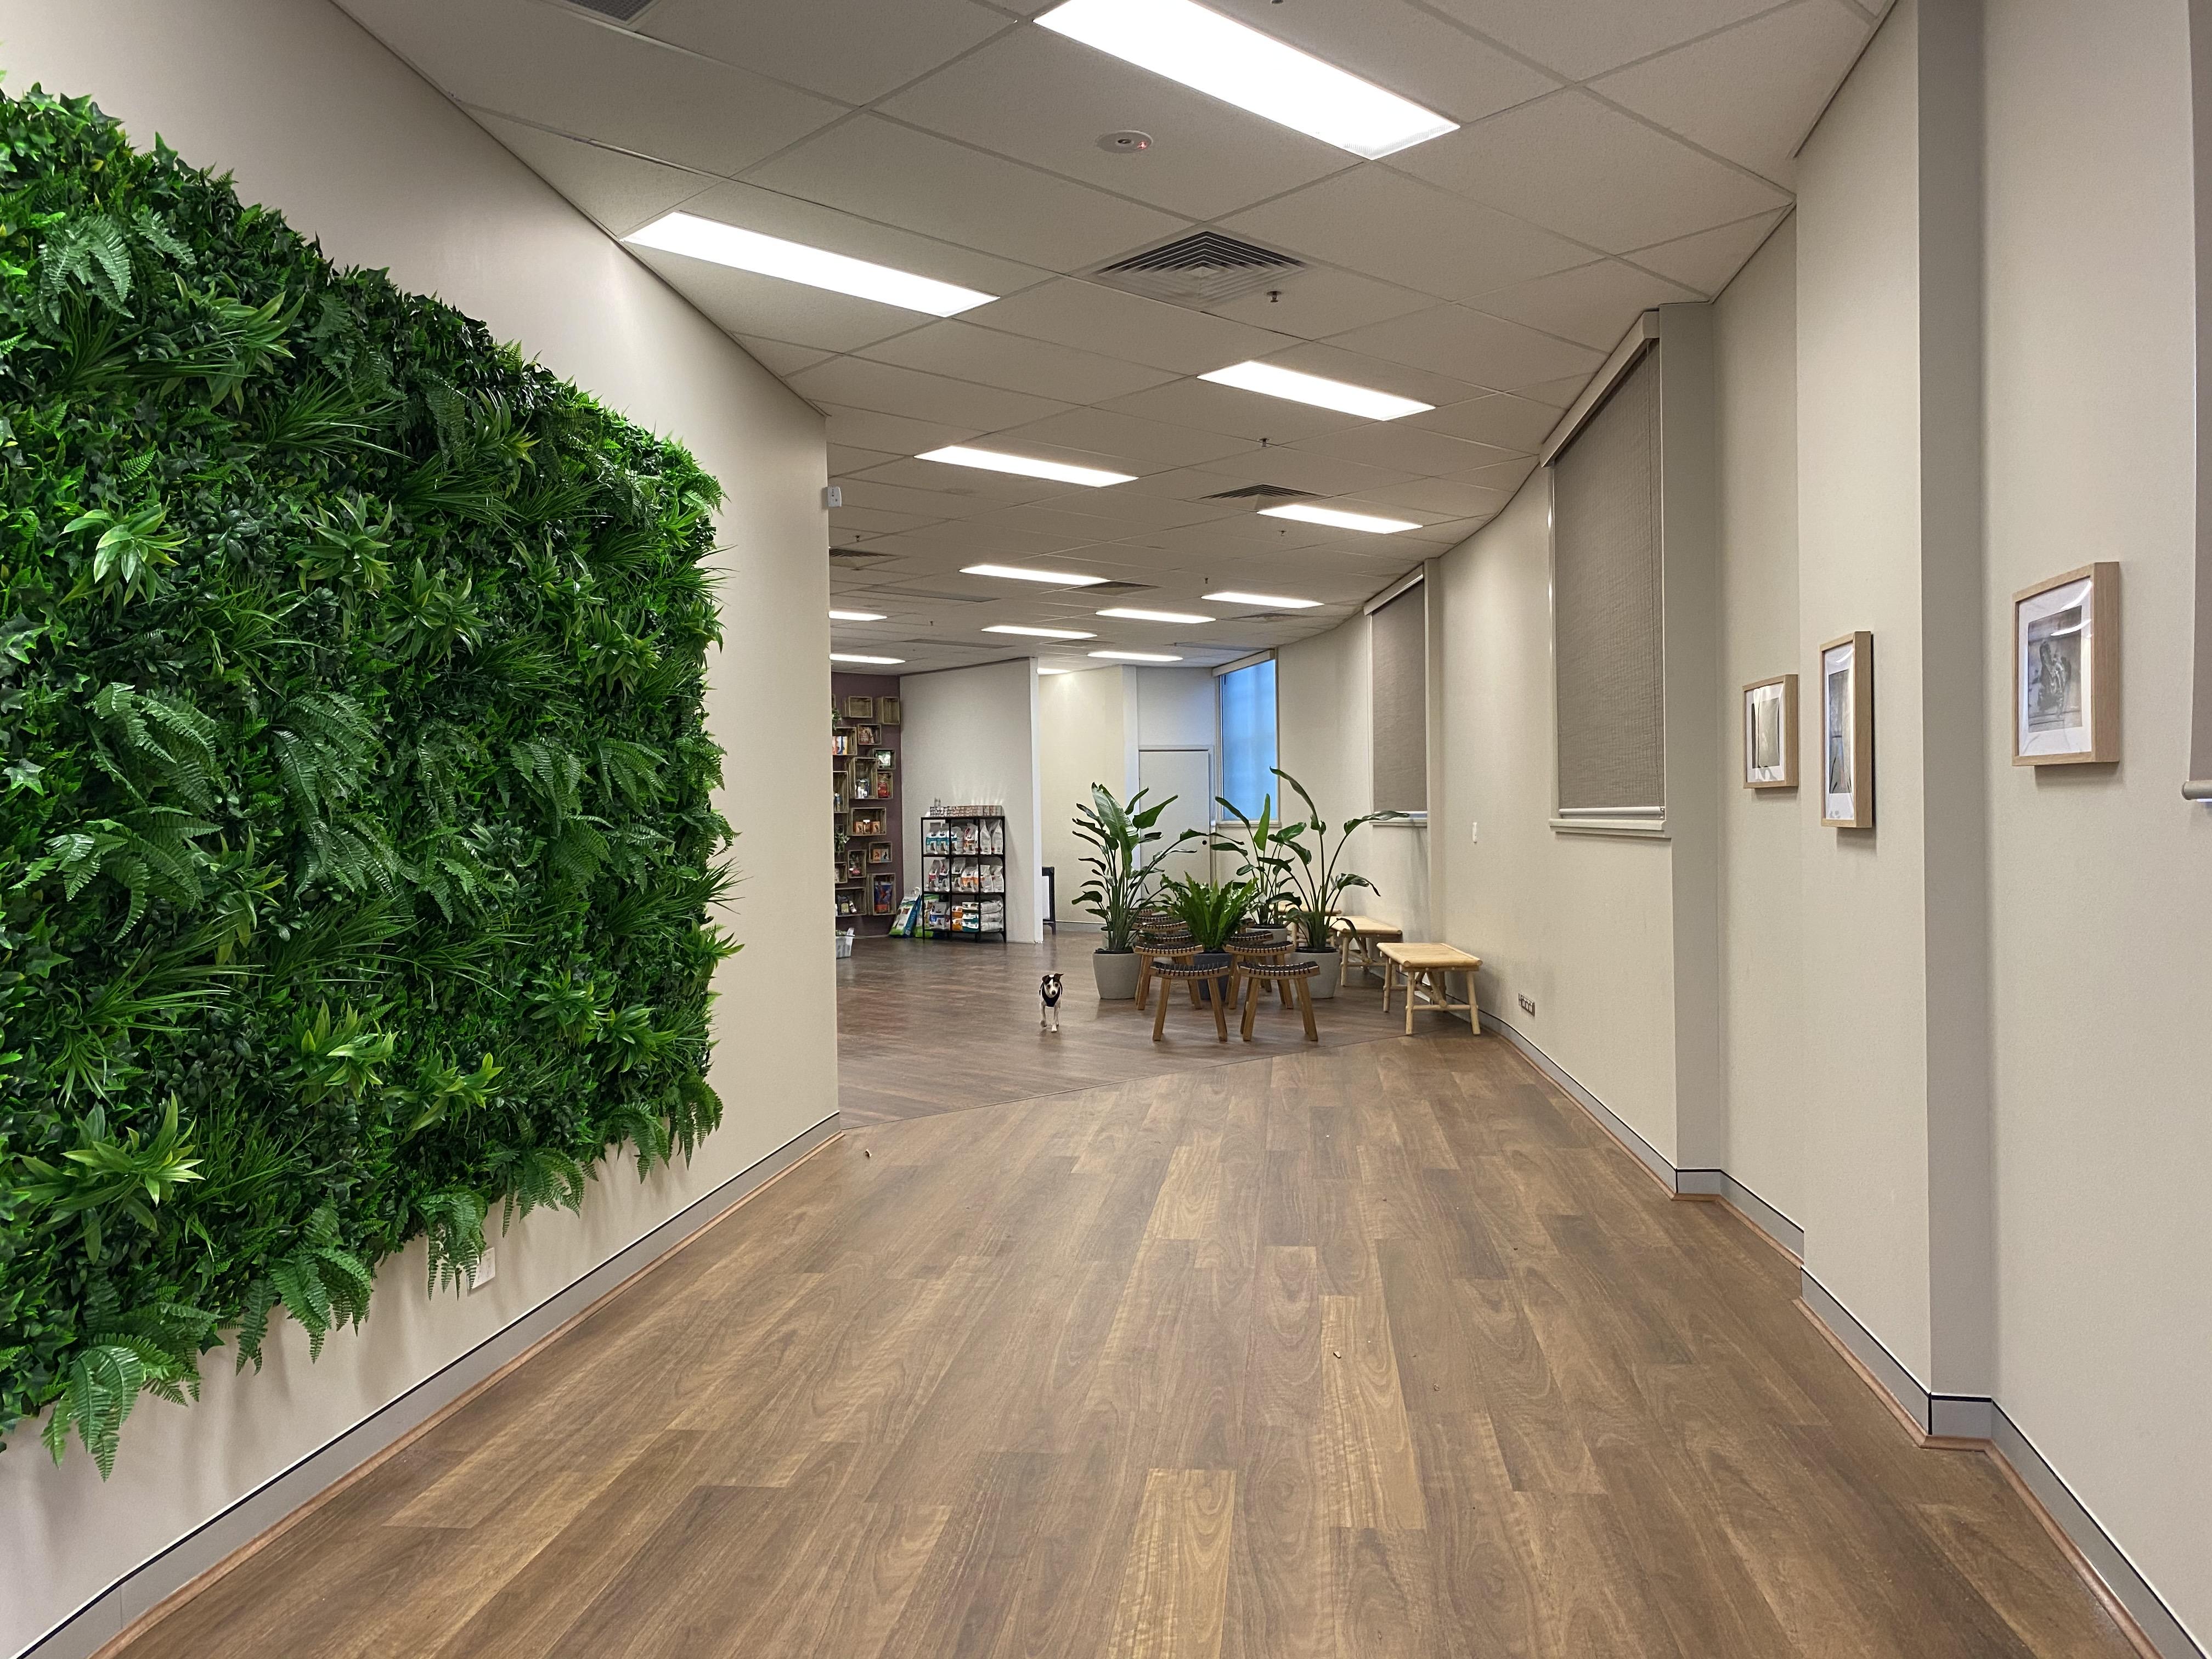 Hospital entrance gallery image